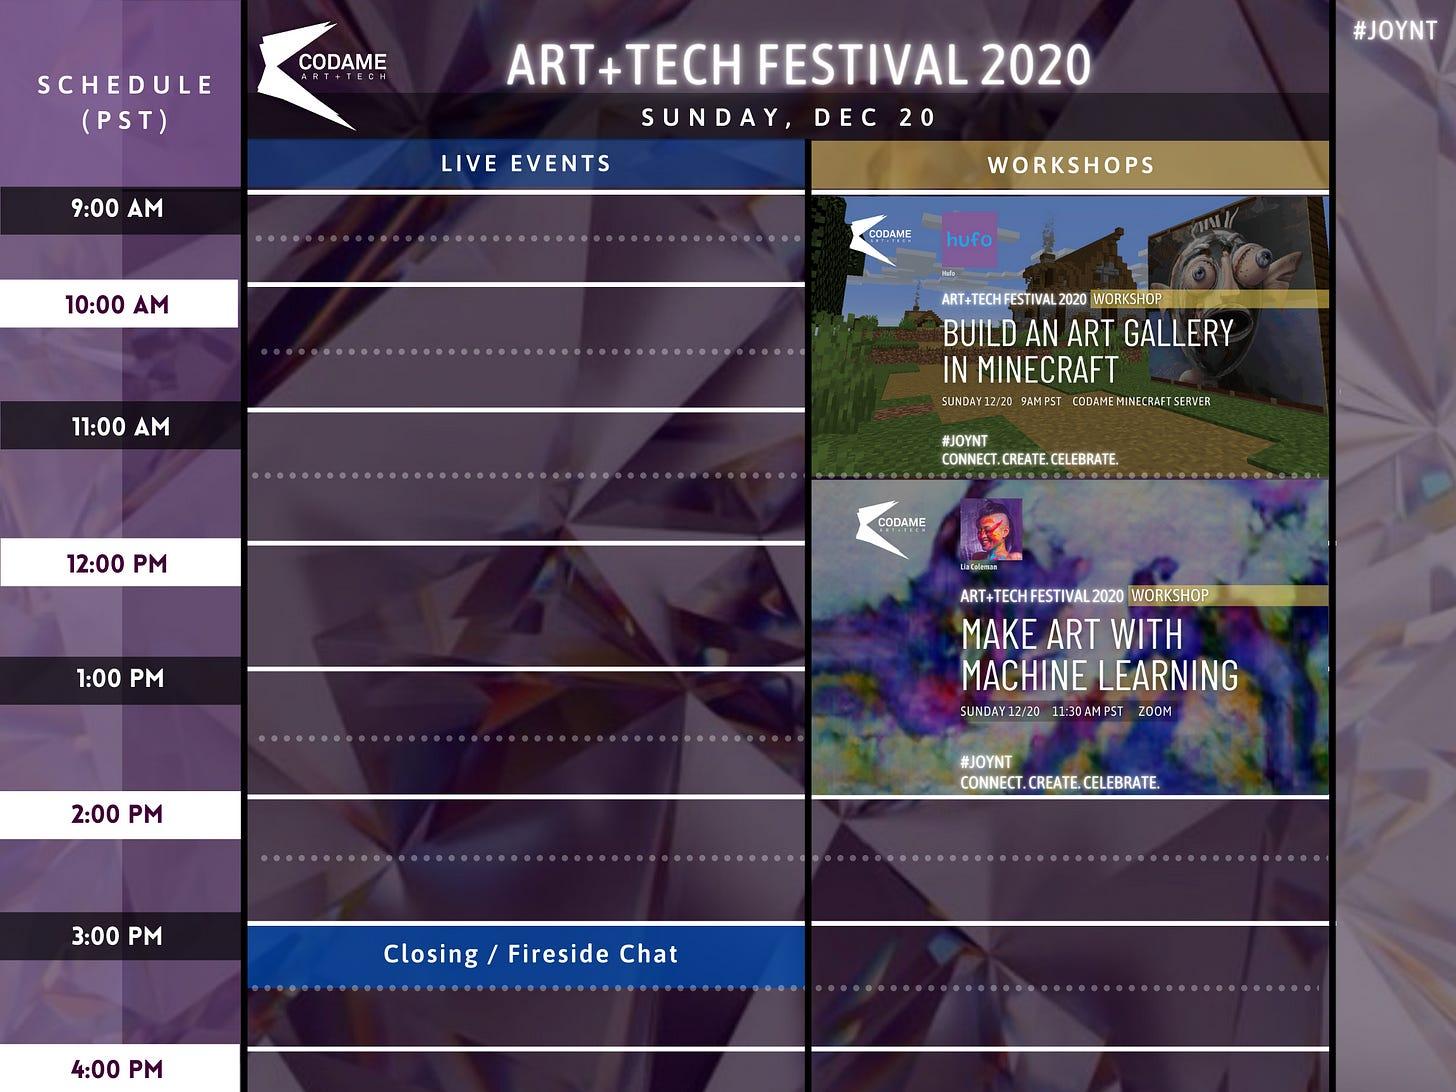 DAY 10: ART+TECH Festival 2020『 JOYNT 』